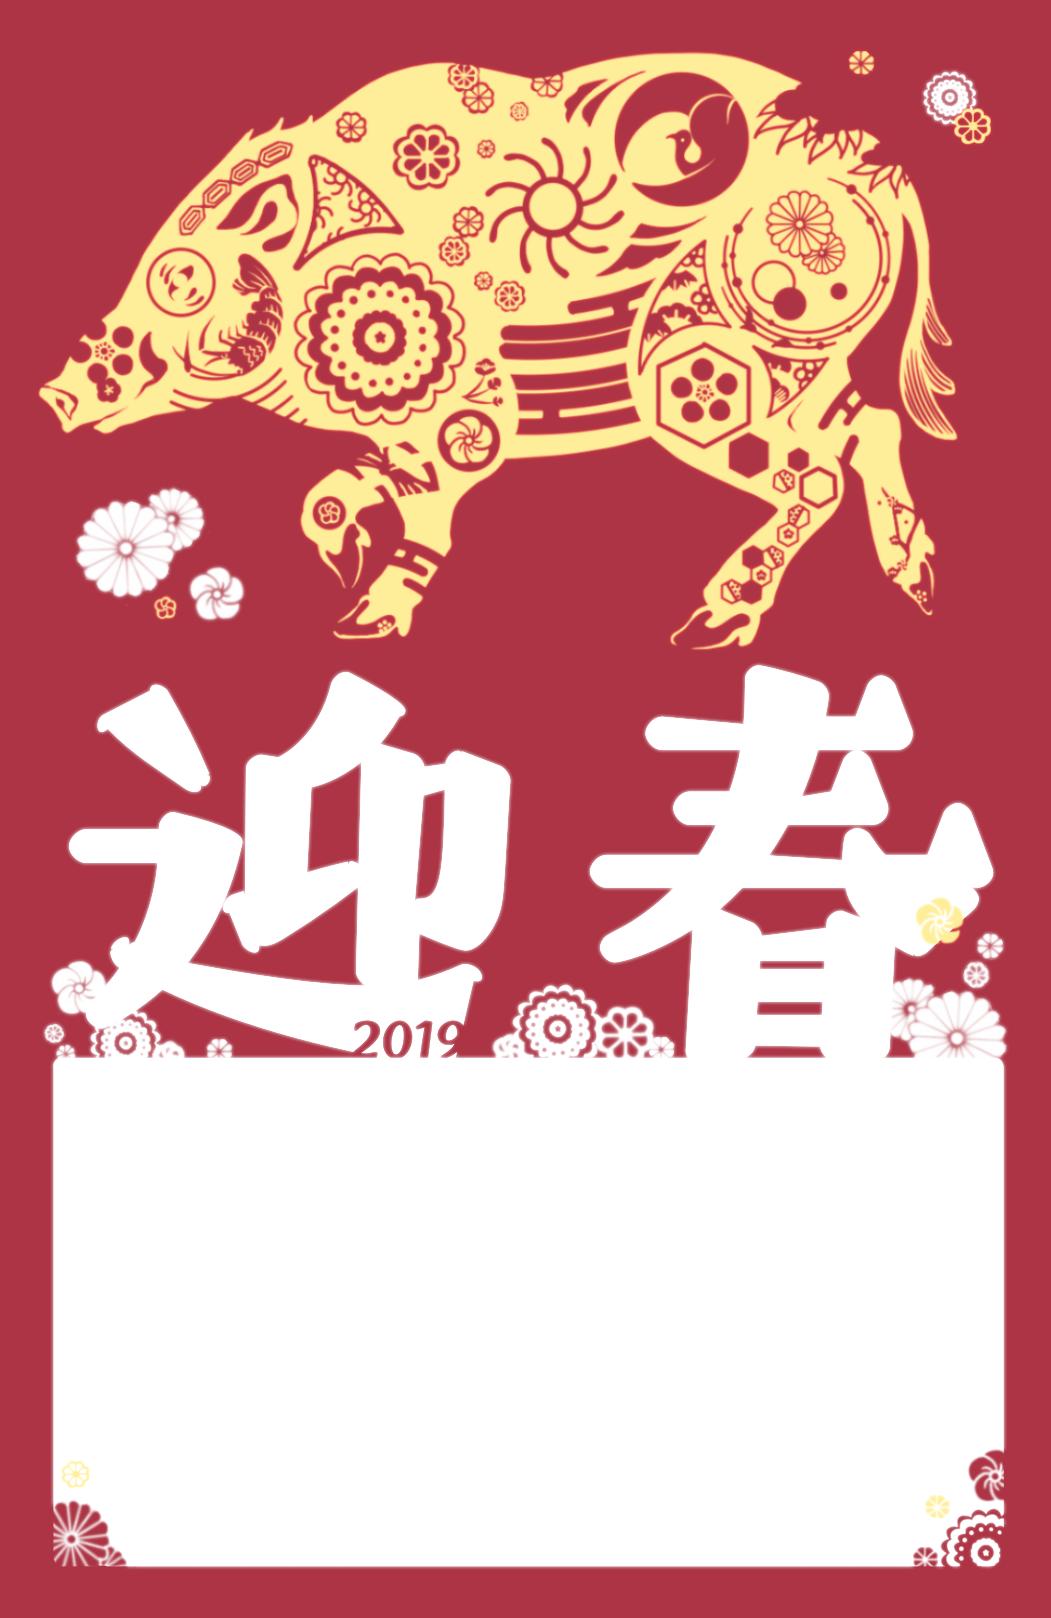 minami/2019年年賀状